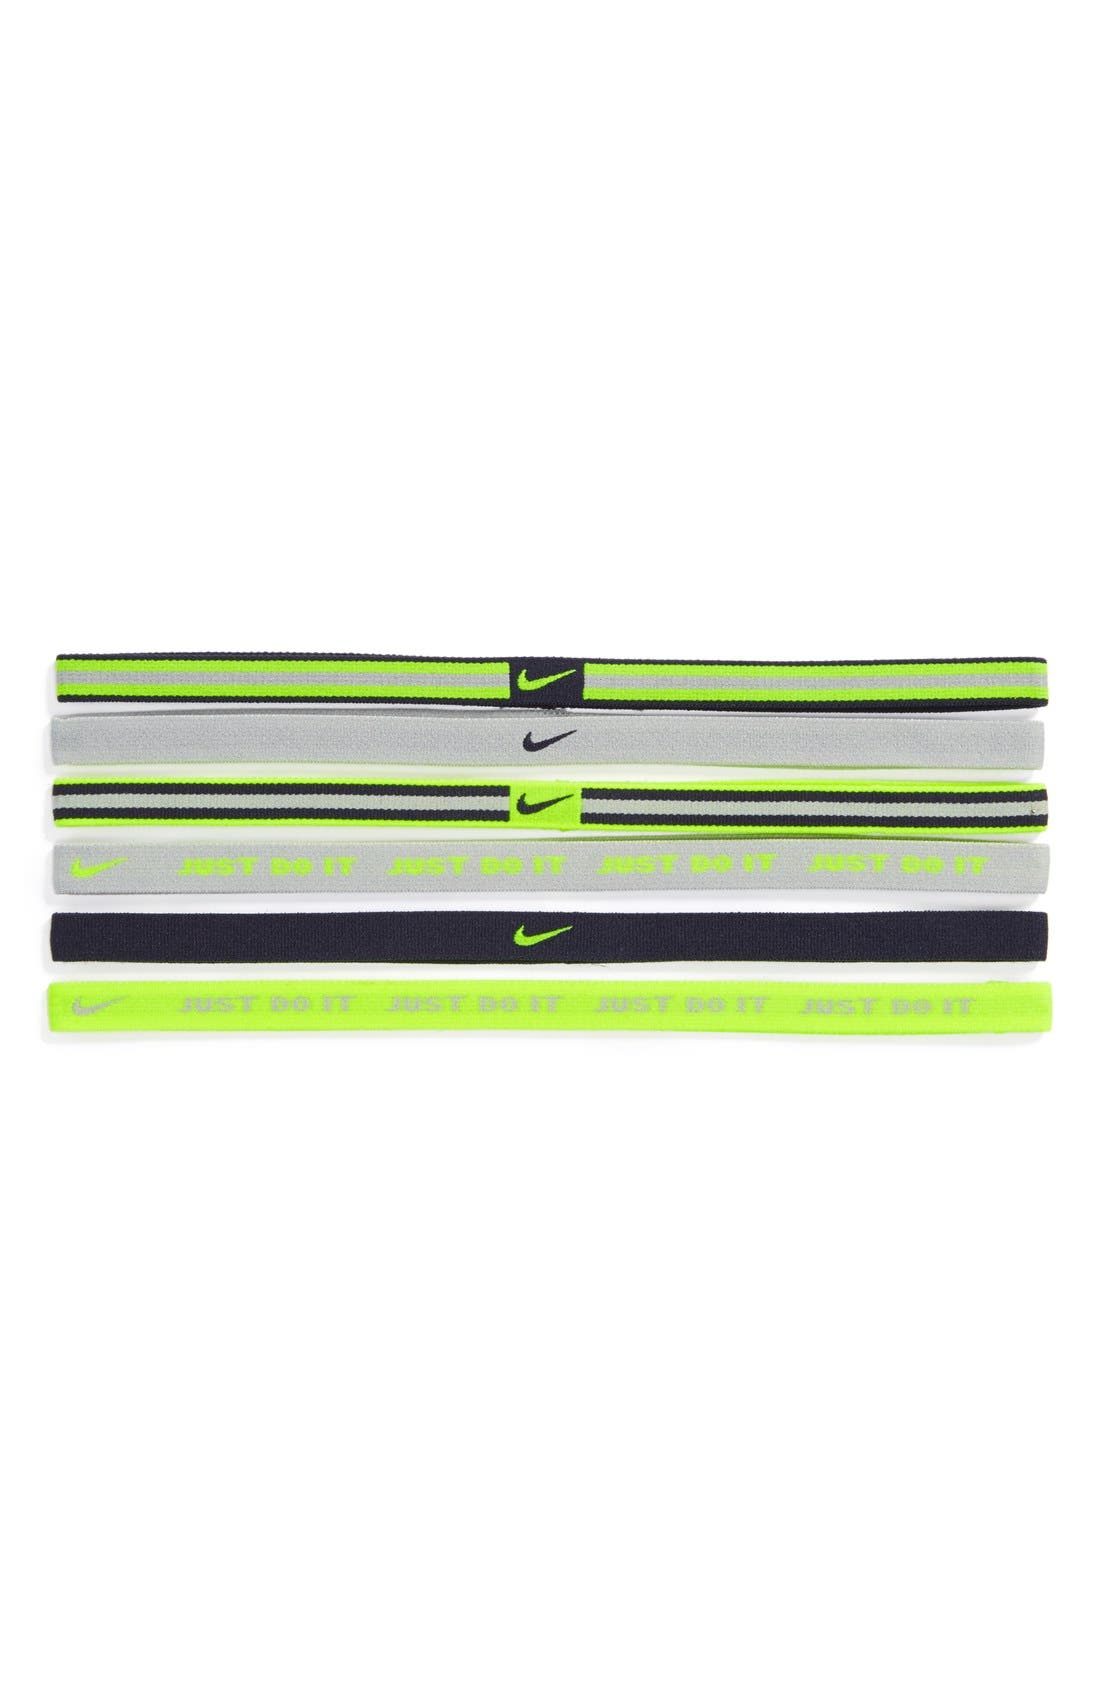 Alternate Image 1 Selected - Nike Wide Sport Headband (6-Pack)